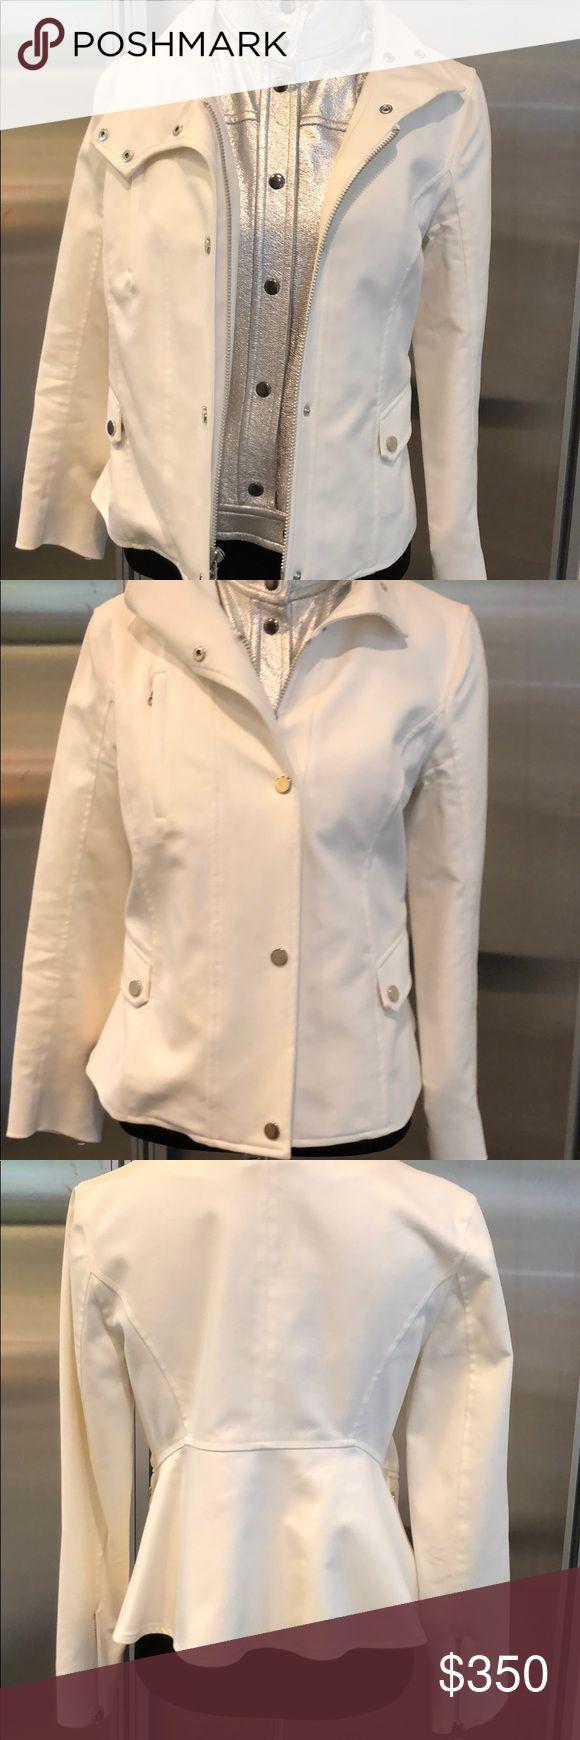 Veronica Beard Blazer w/ Silver Leather Dickey Off white